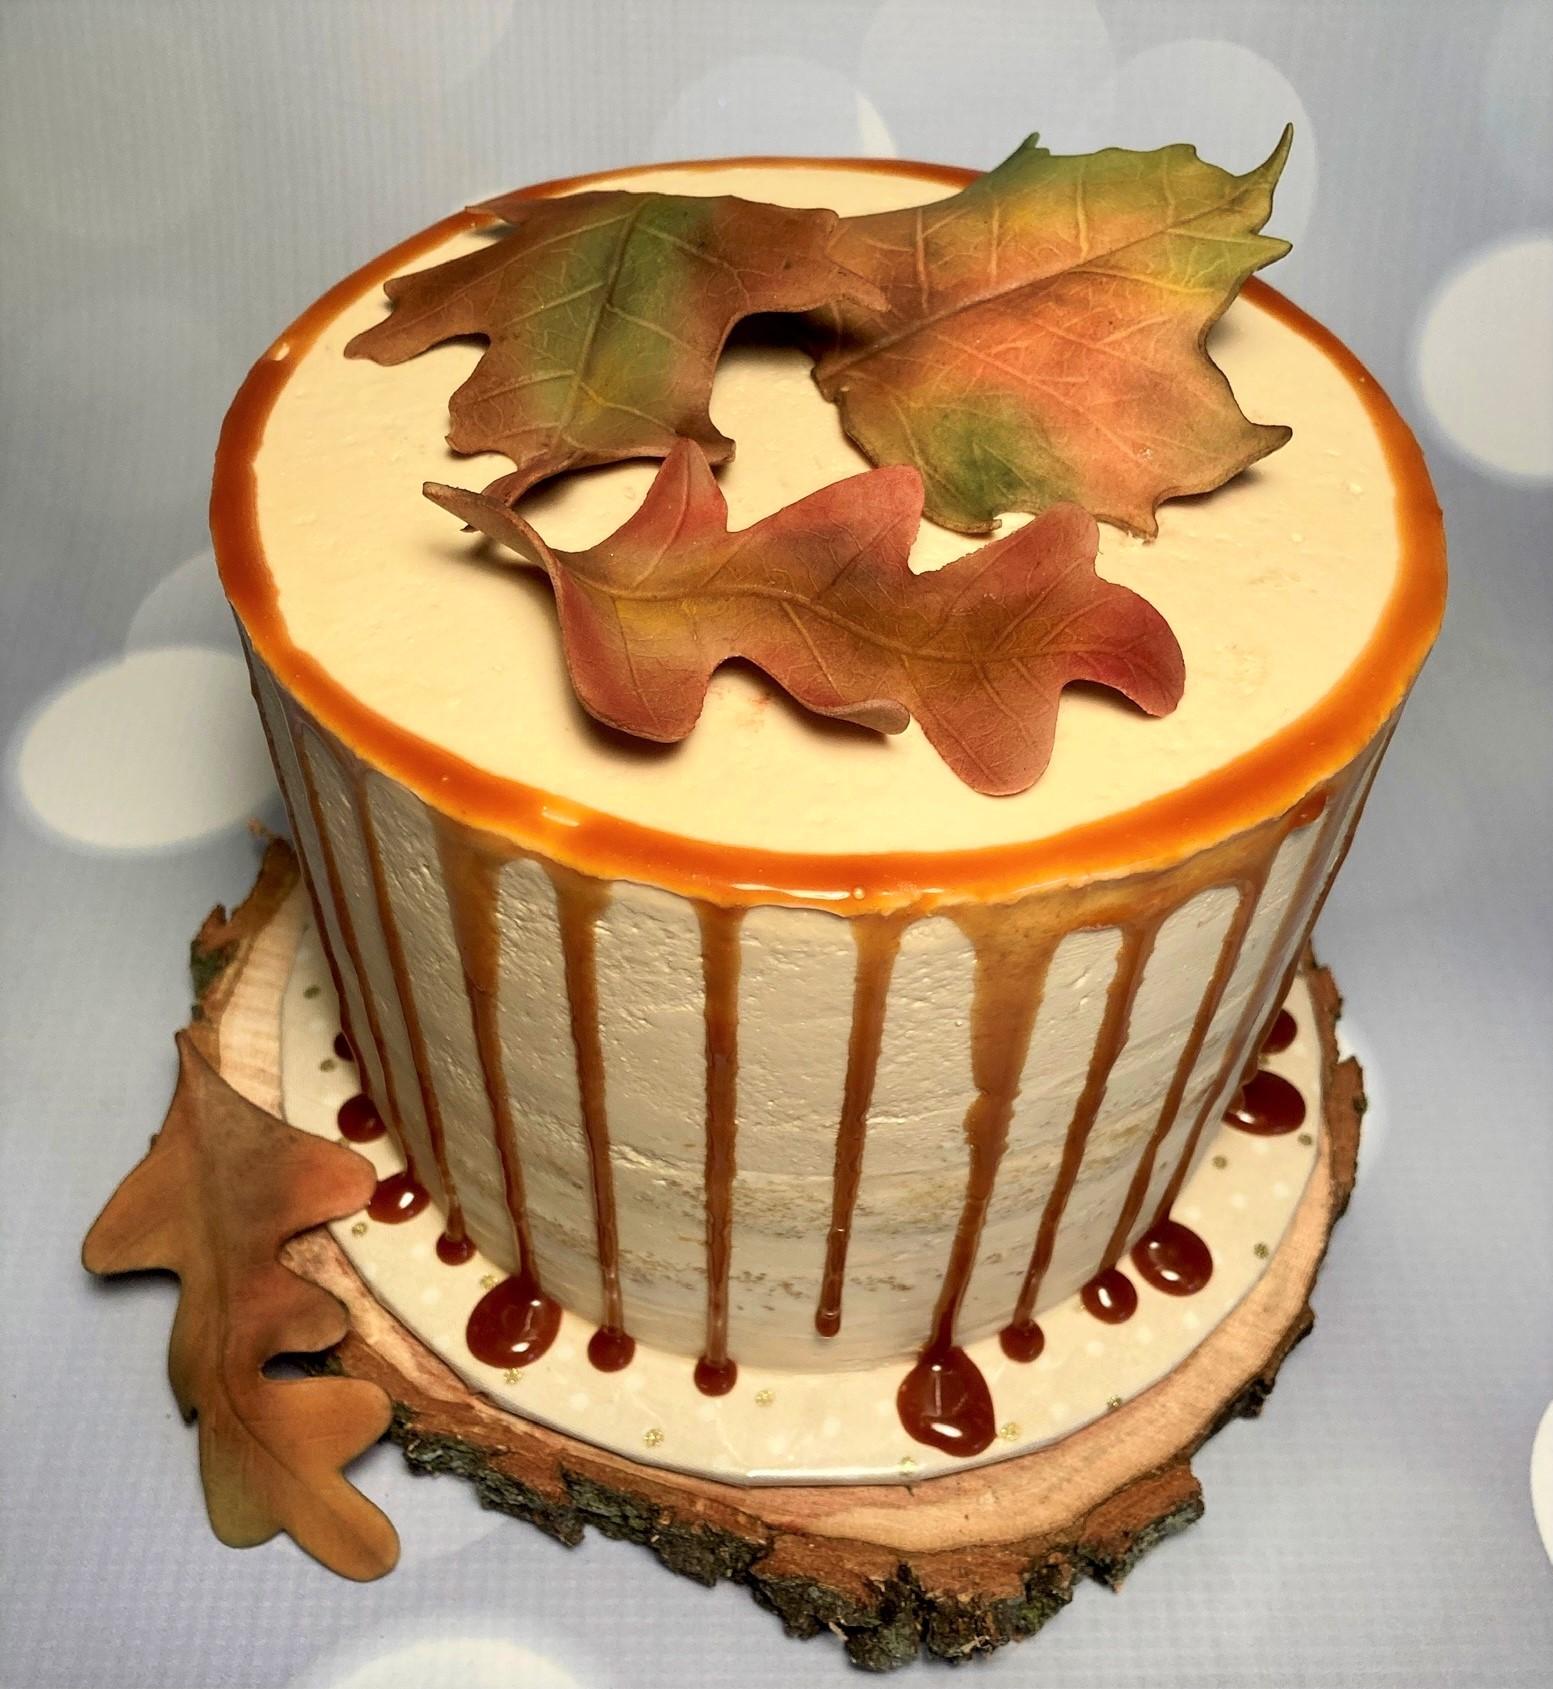 Fall-Cake-3-Leaves